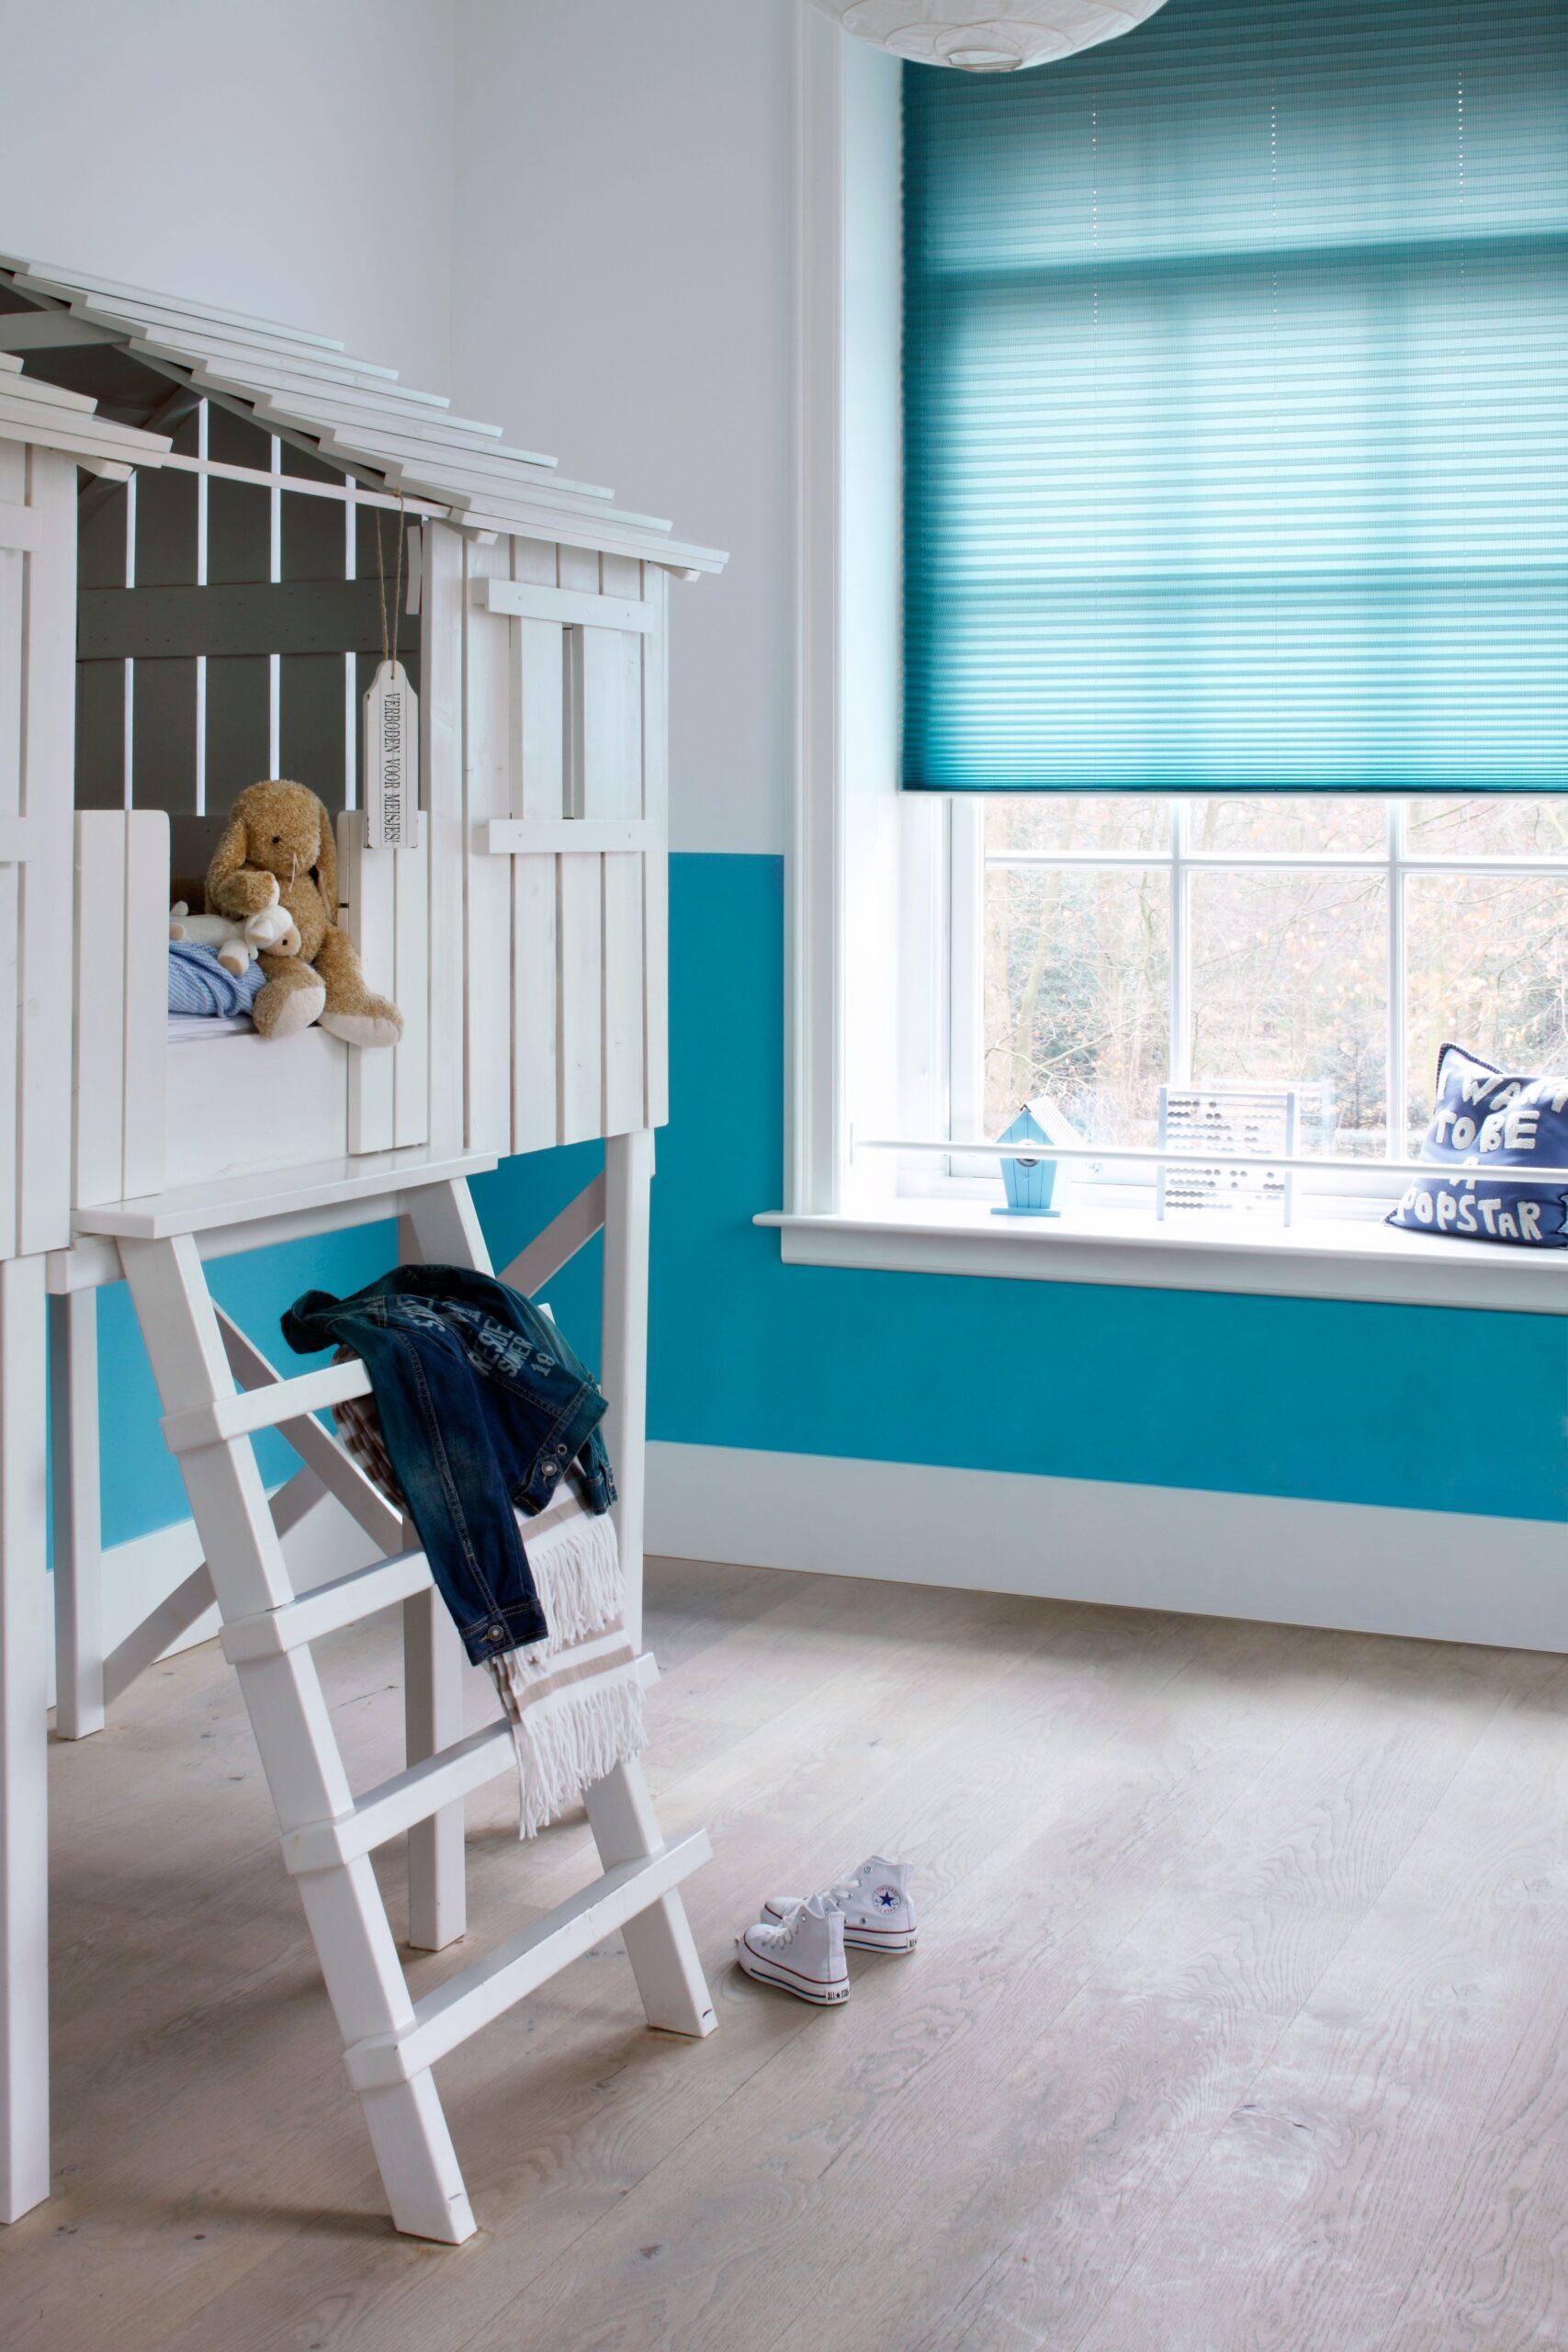 Full Size of Felblauwe Plisse Shade In Kinderkamer Blauw Fris Trend Foto Regal Kinderzimmer Weiß Plissee Fenster Regale Sofa Kinderzimmer Plissee Kinderzimmer